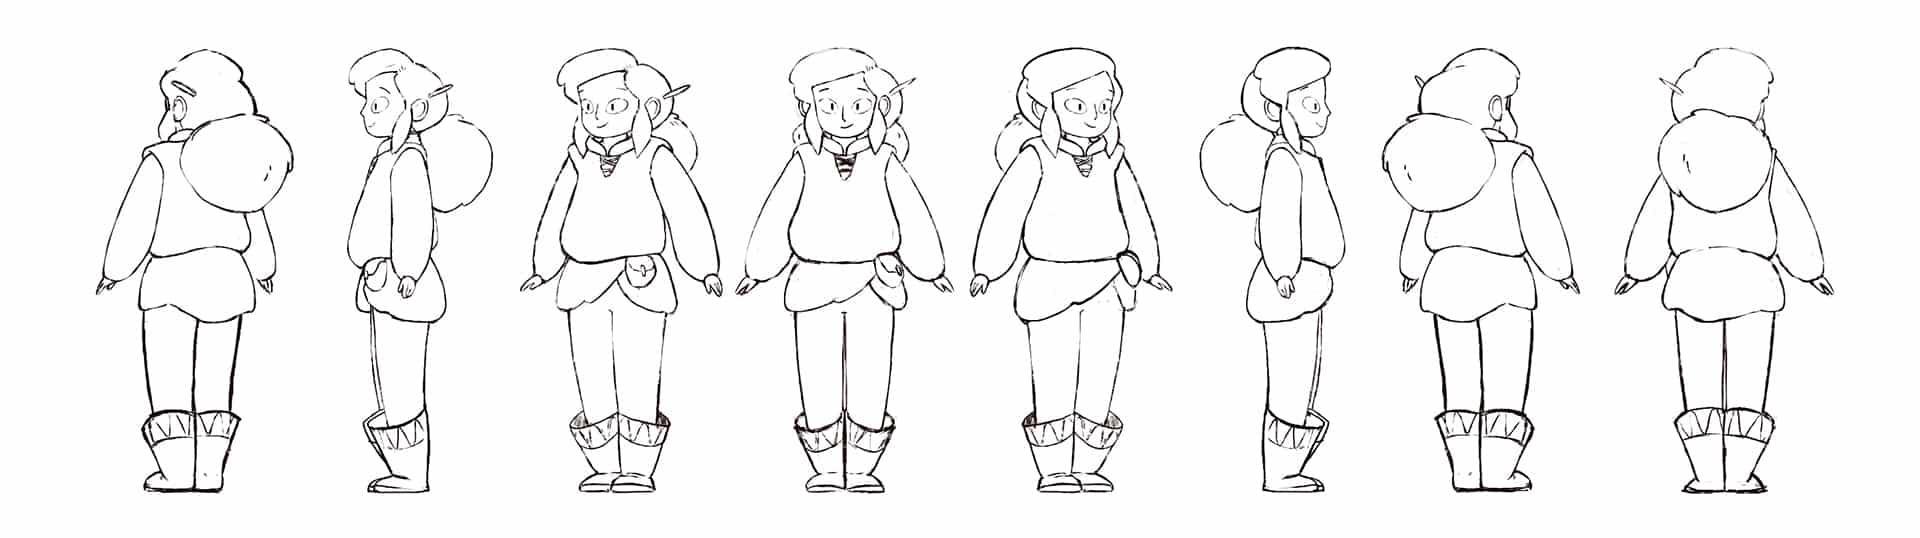 diseño de personaje turn around